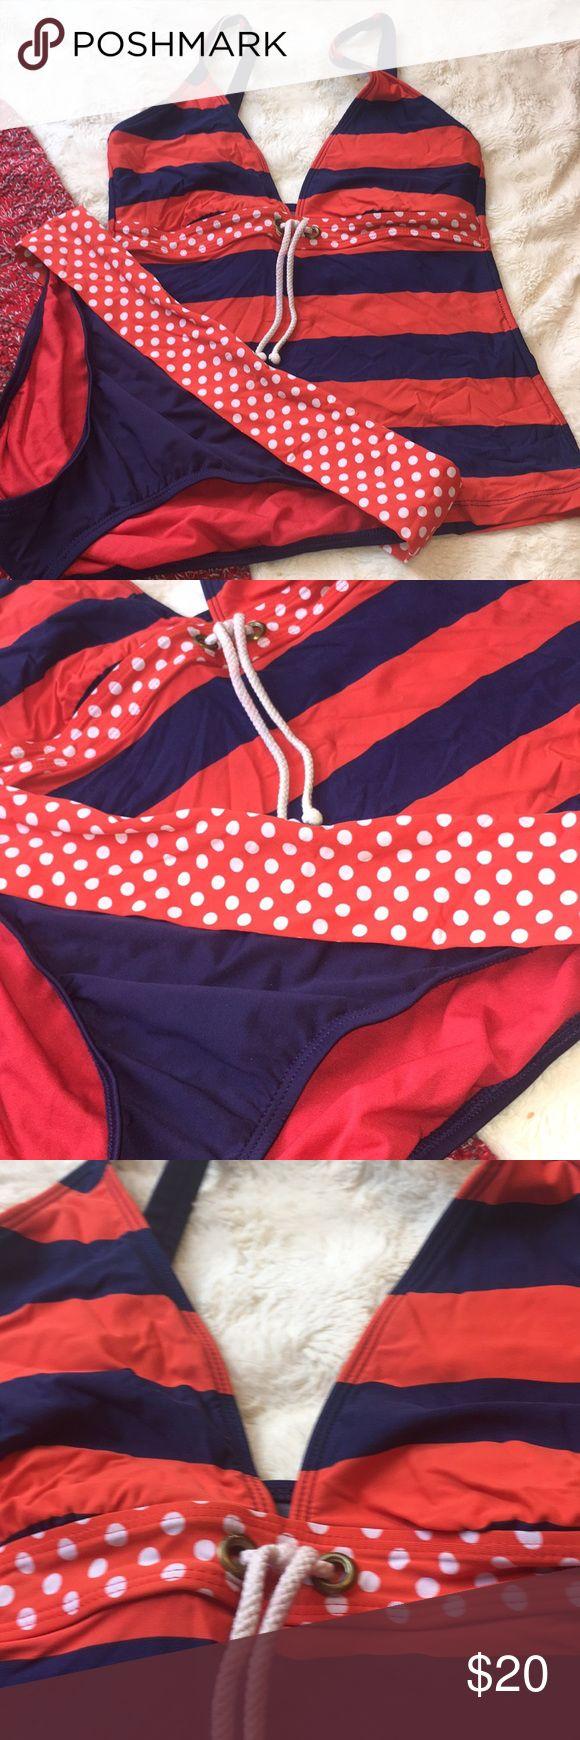 Womens Tankini Swimsuit Size 14 Tommy Hilfiger Swim